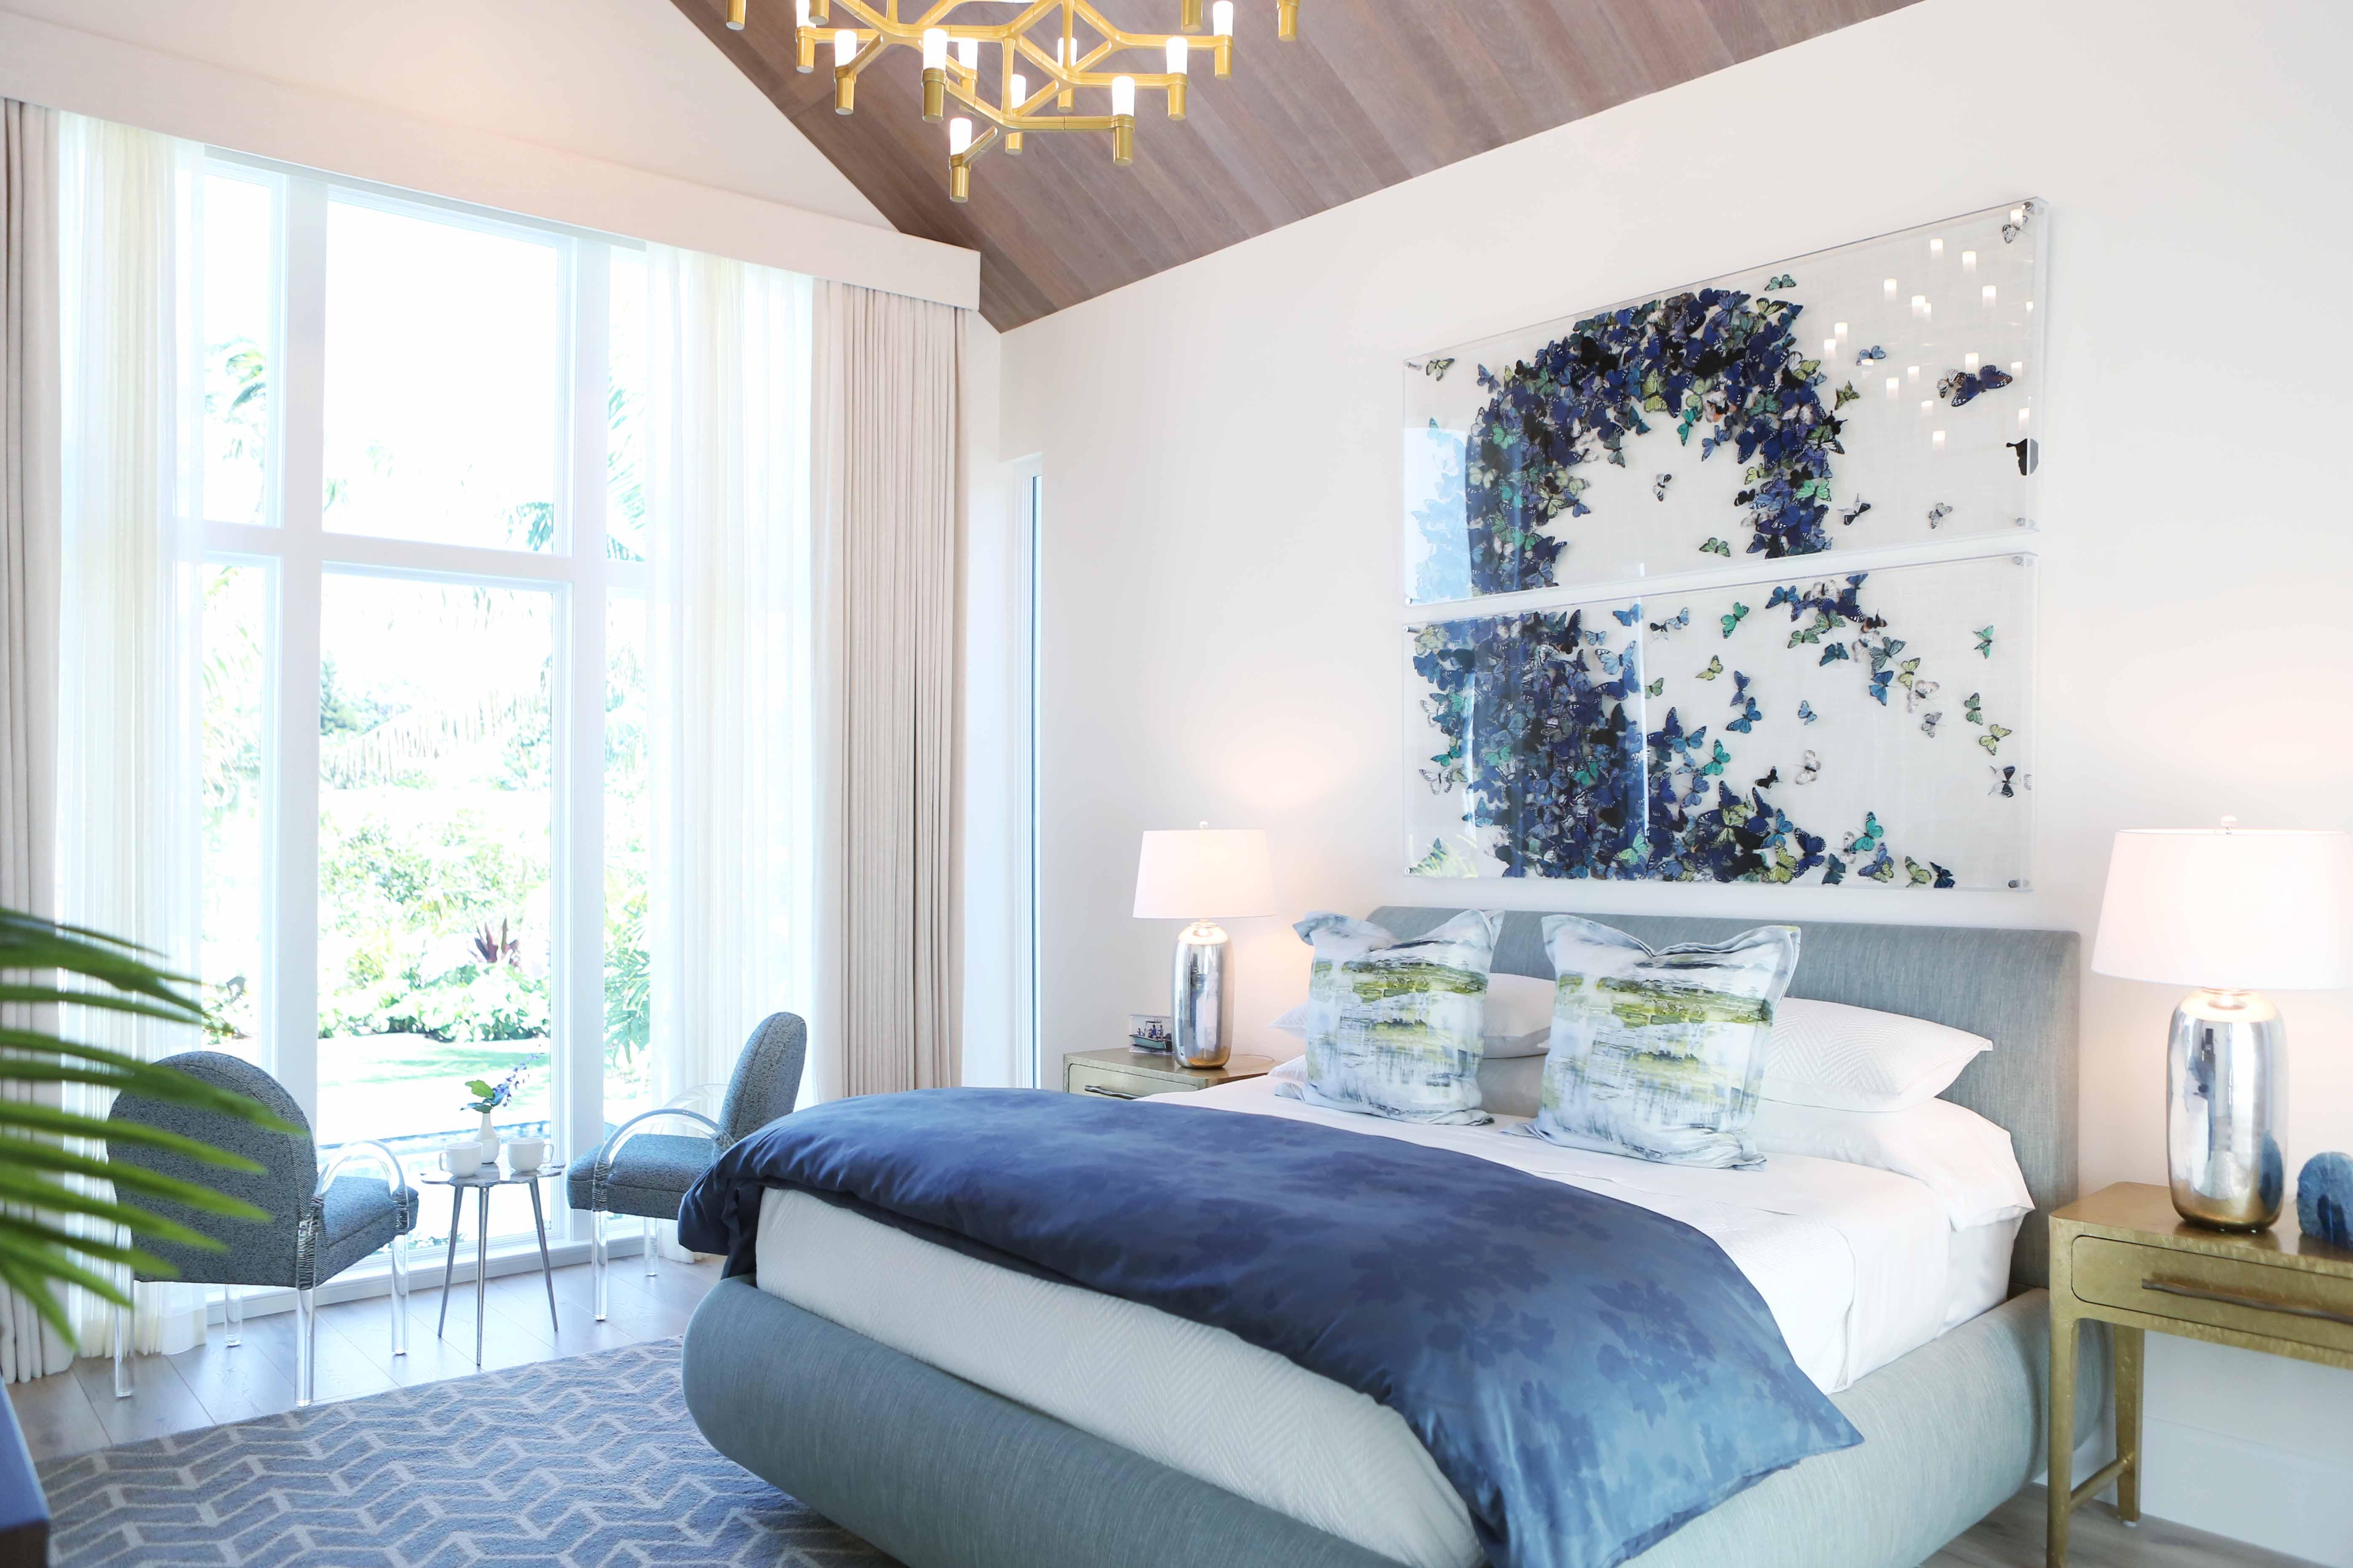 Jeffrey Fisher Home Luxury Interior Design Imagined Home Decor Custom Master Bedroom Design